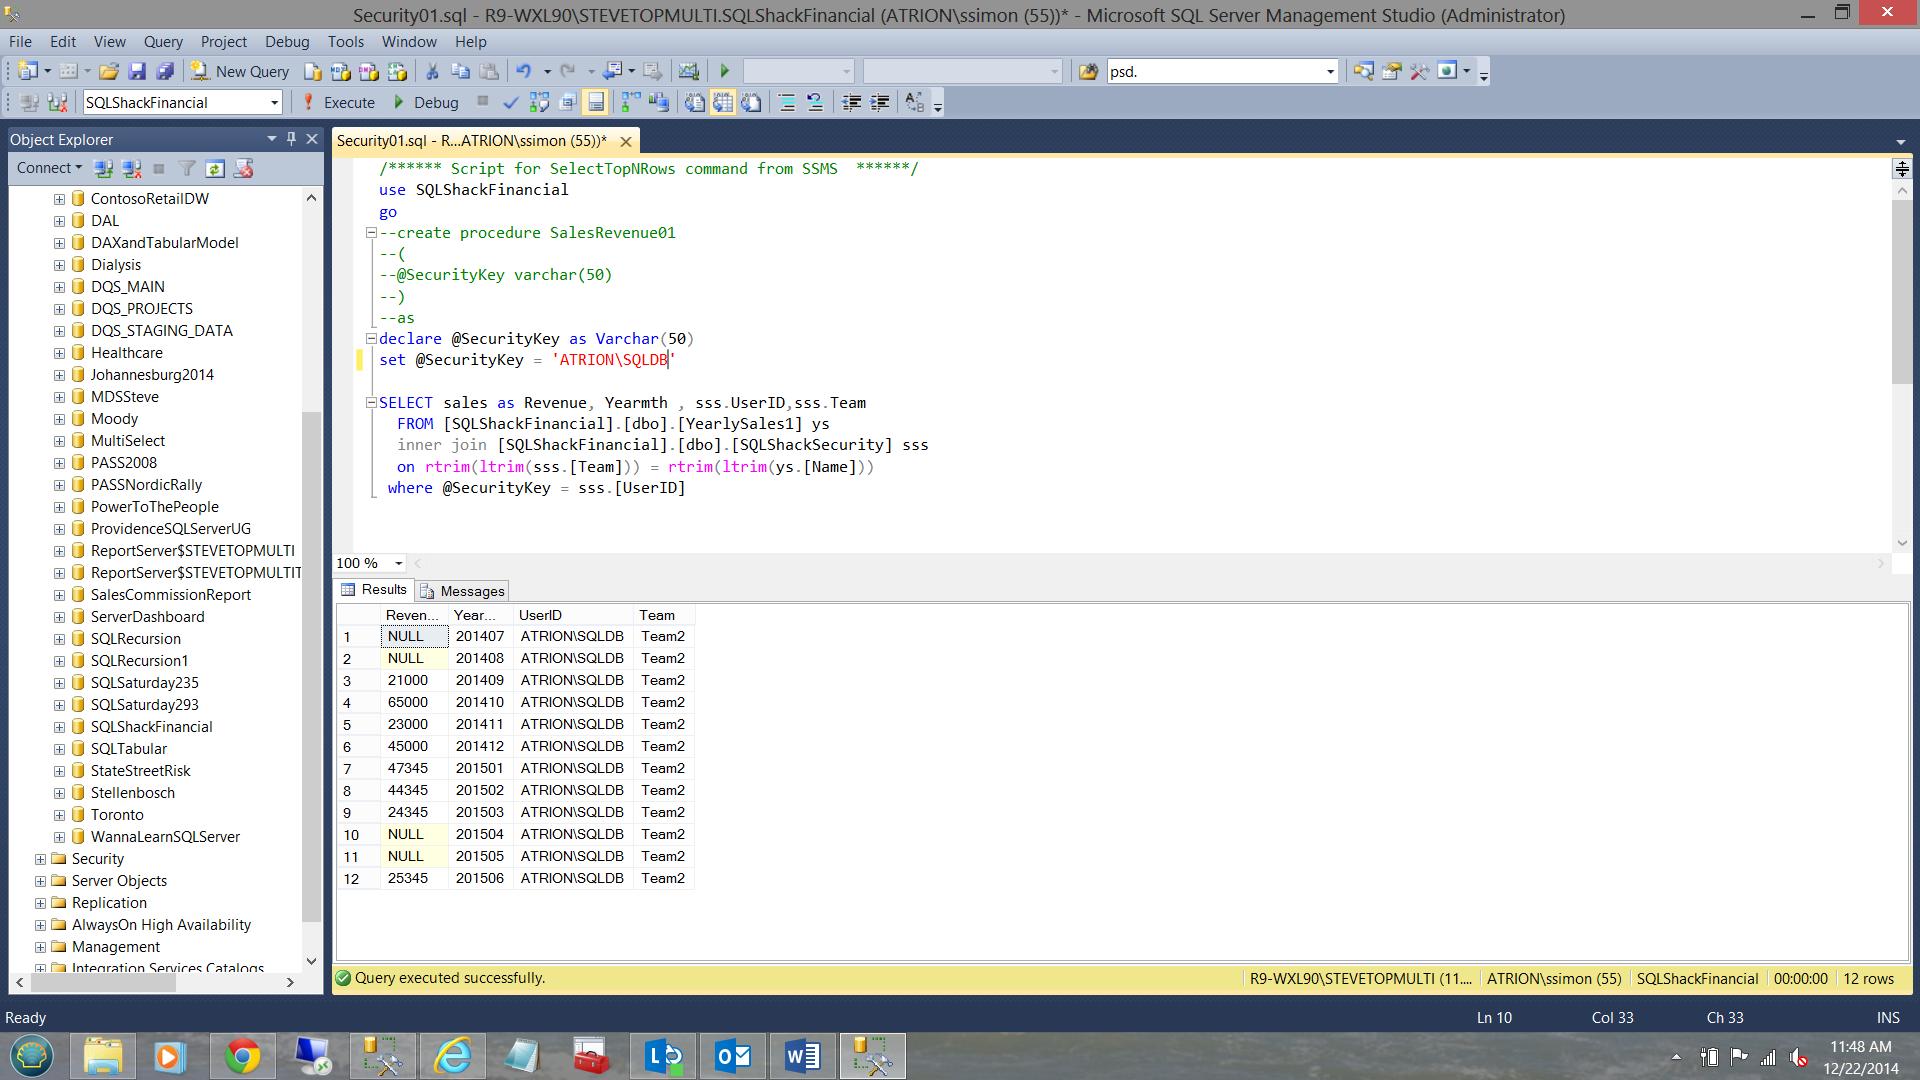 SQL Server安全机制–如何控制用户能够在报告中查看哪些数据6